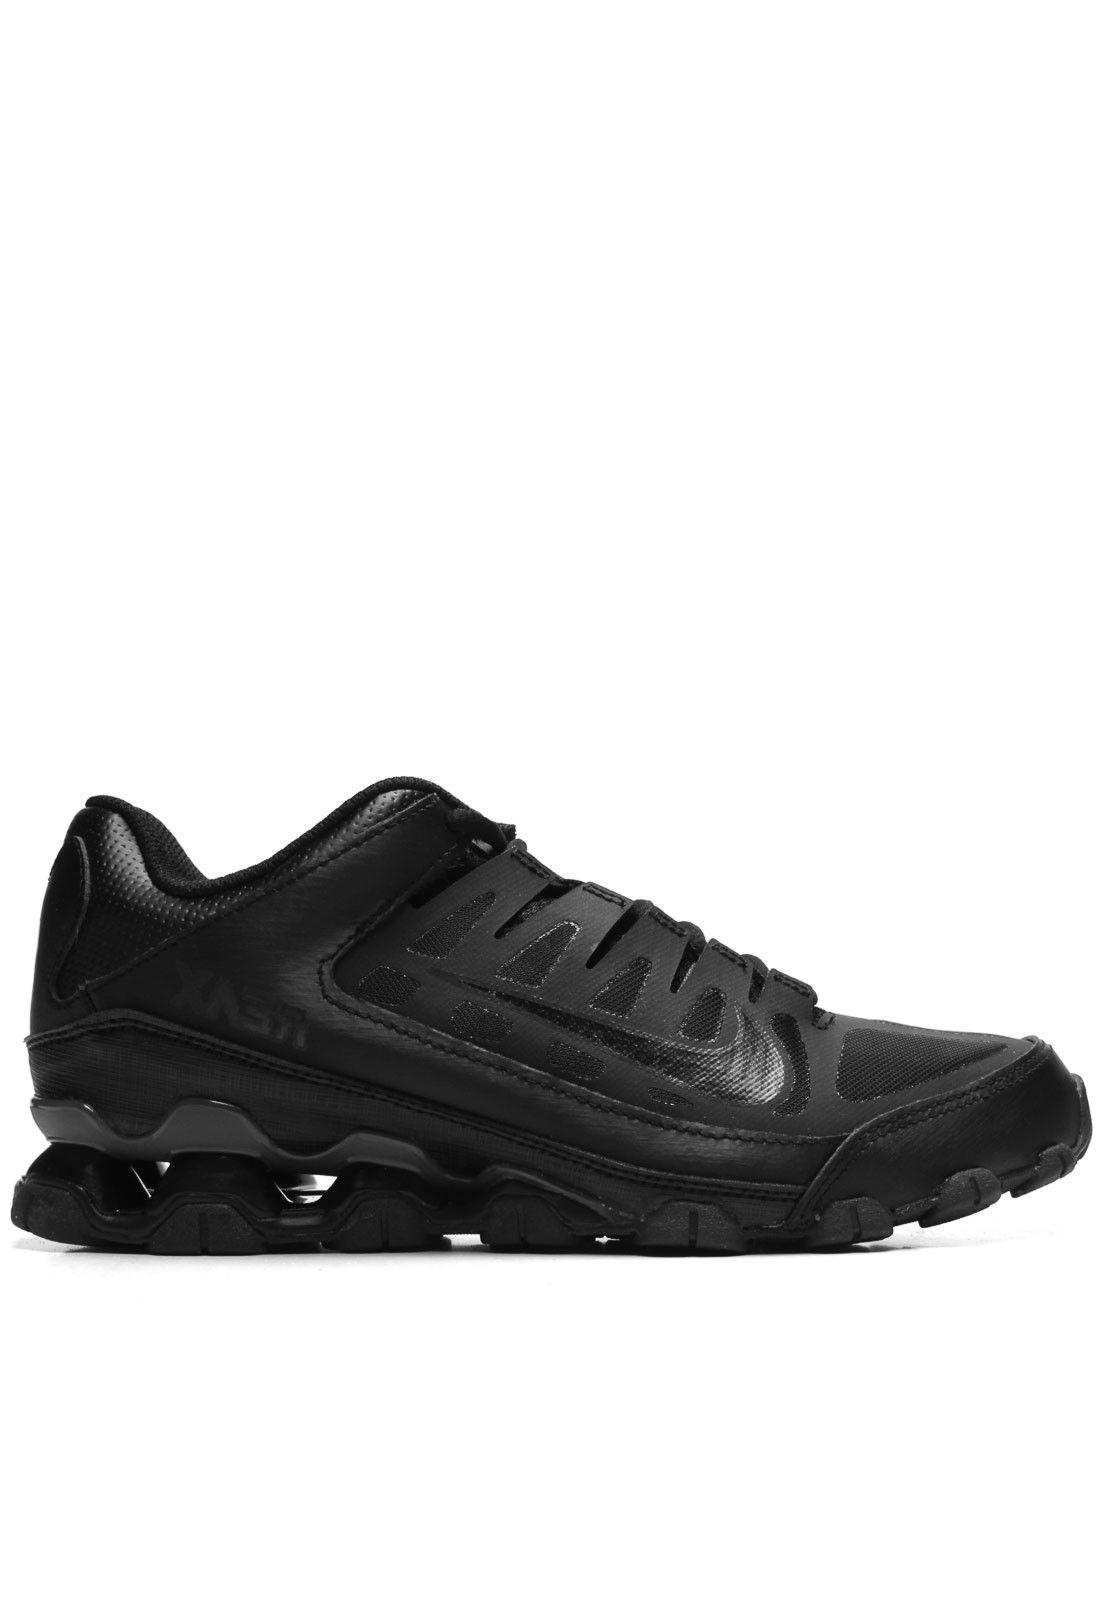 Tenis Caminhada Masculino Nike Reax 8